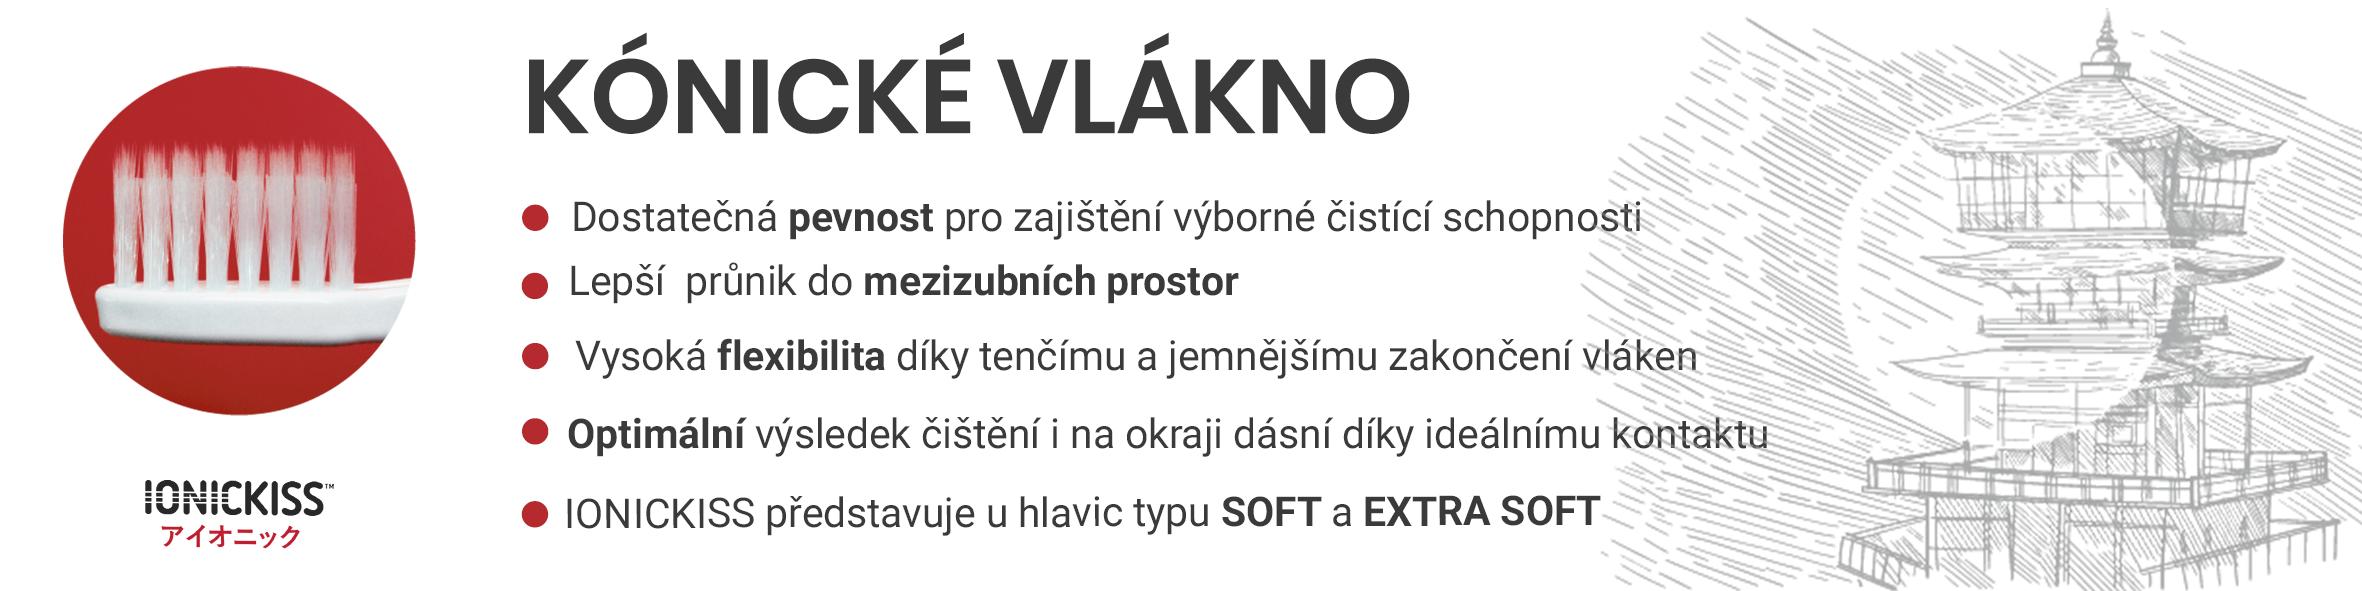 konicka_vlakna_web